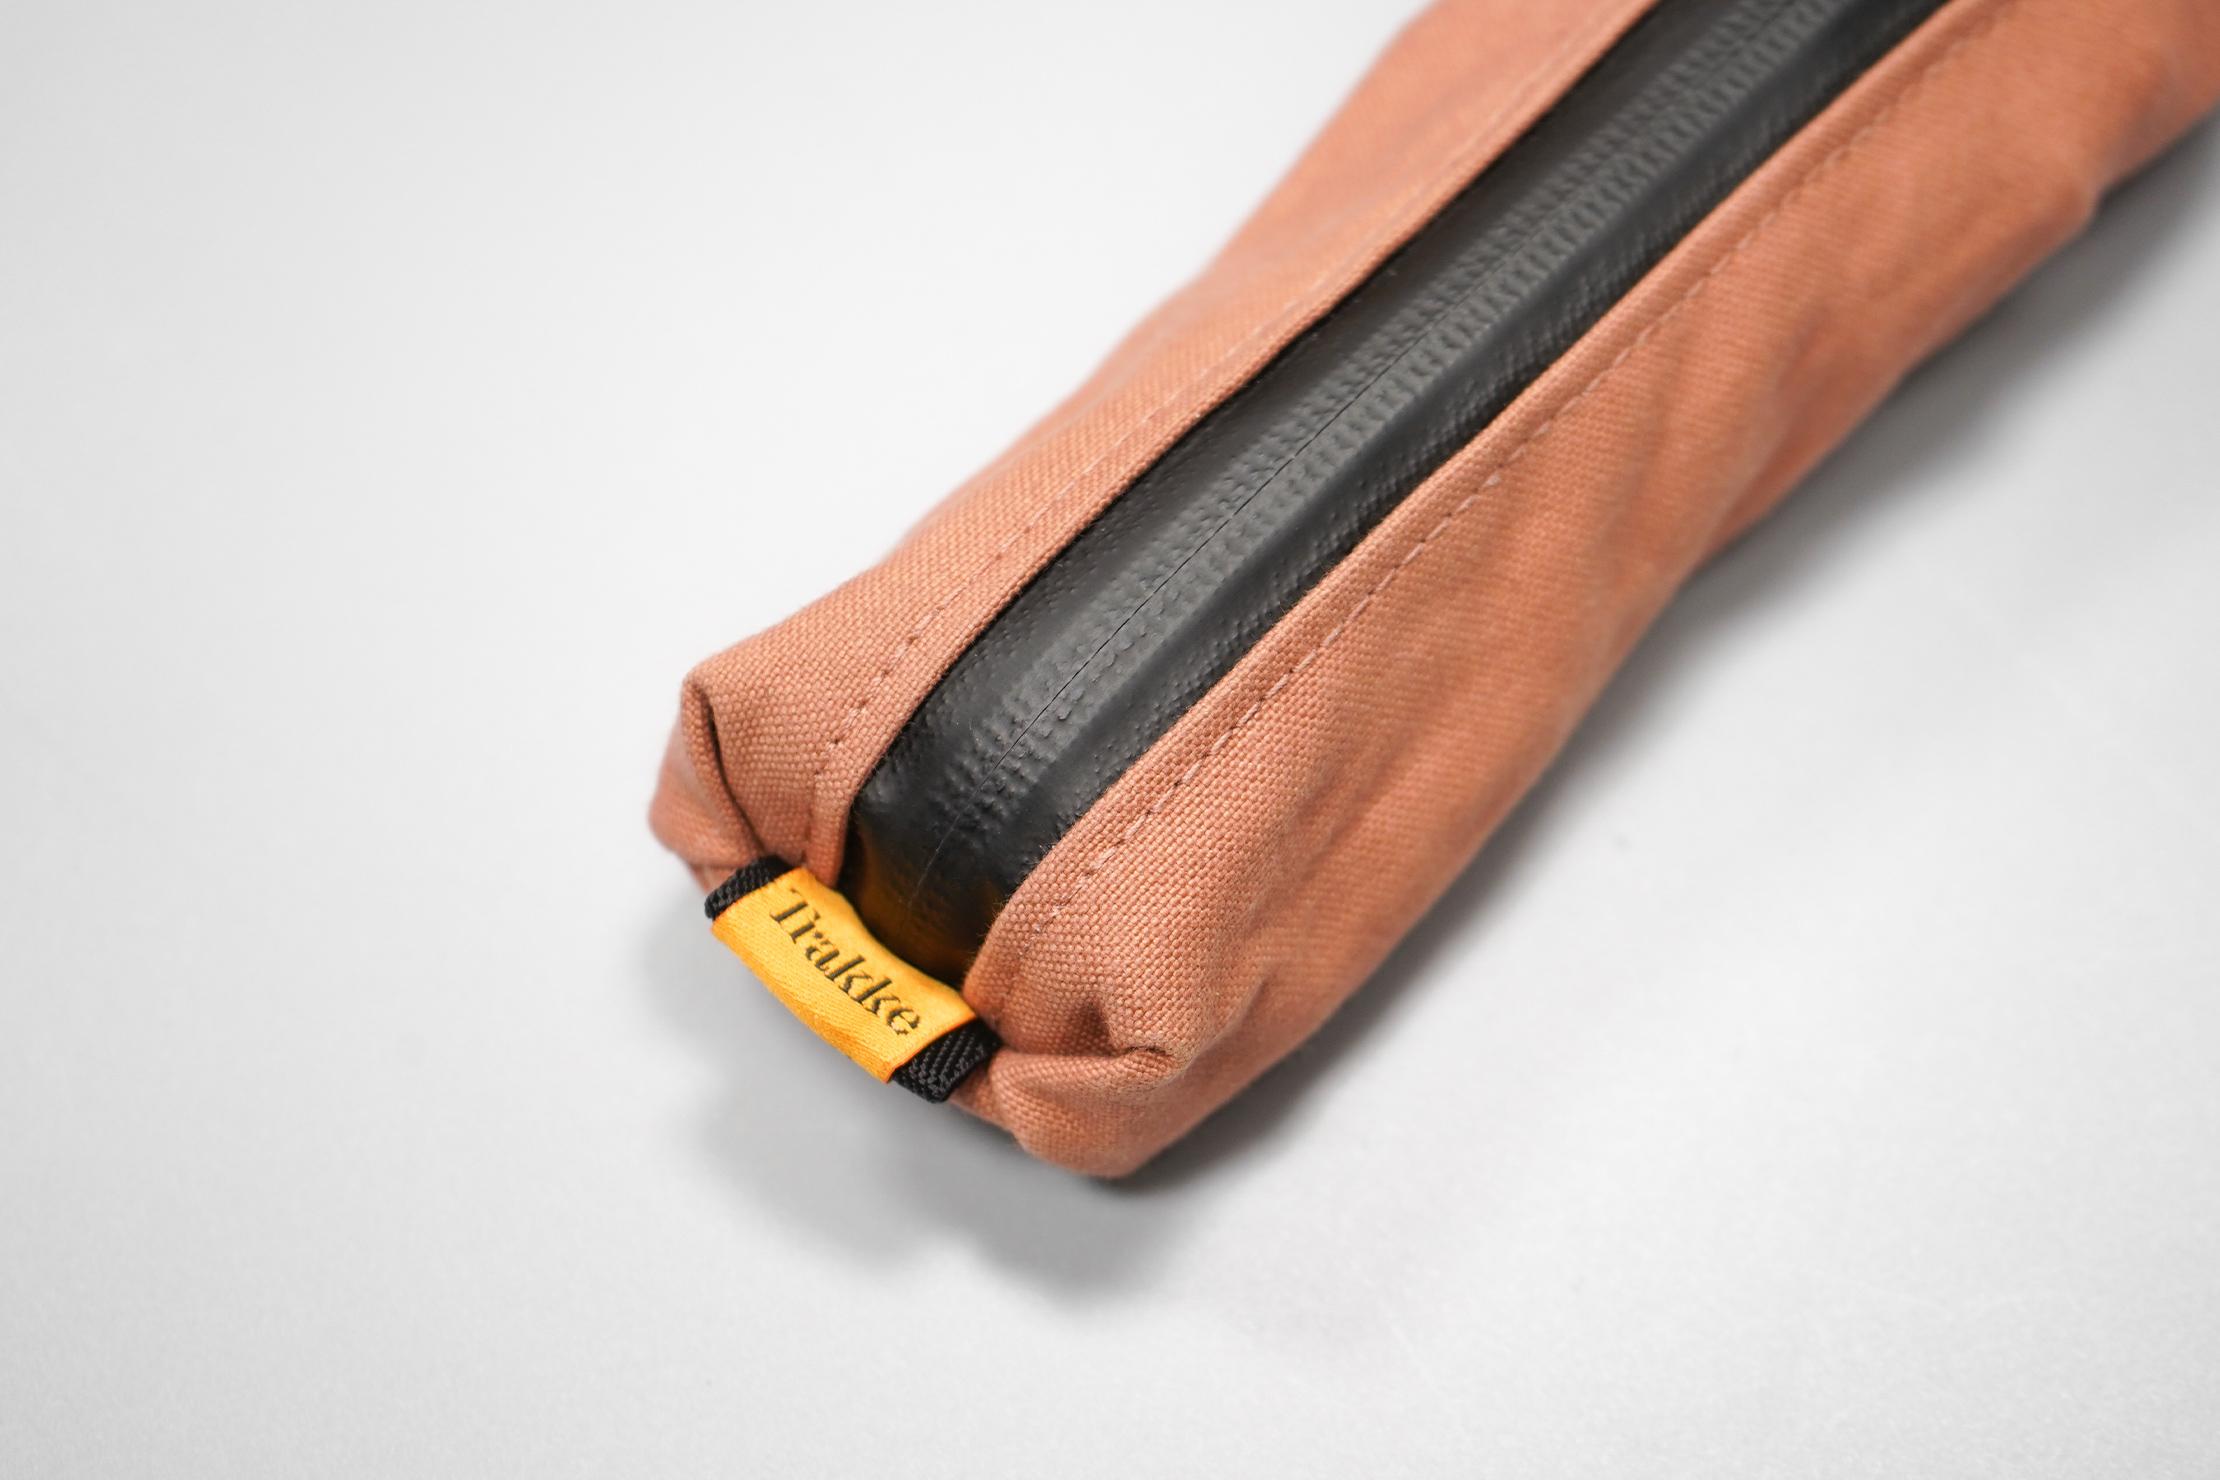 Trakke Pencil Case | The Trakke logo and signature dry-finish waxed canvas